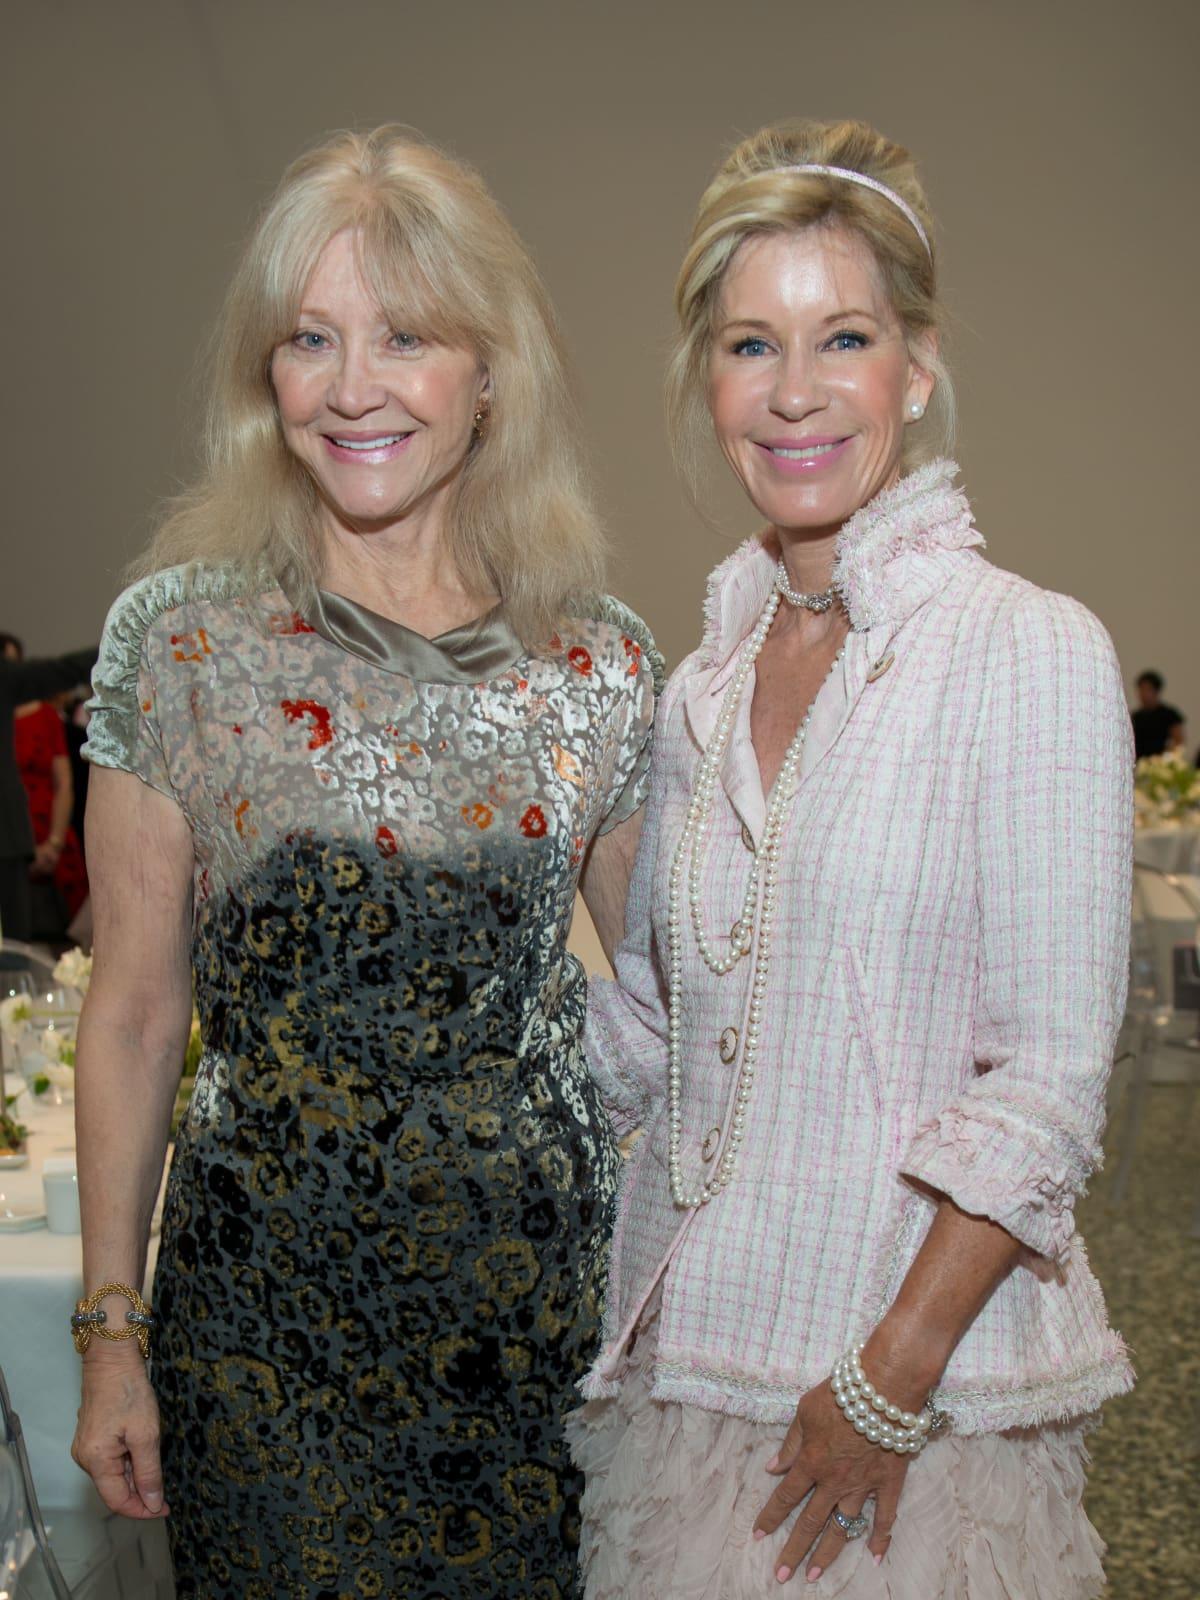 Astrid VanDyke, Penelope Wright at Oscar de la Renta fashion show at MFAH